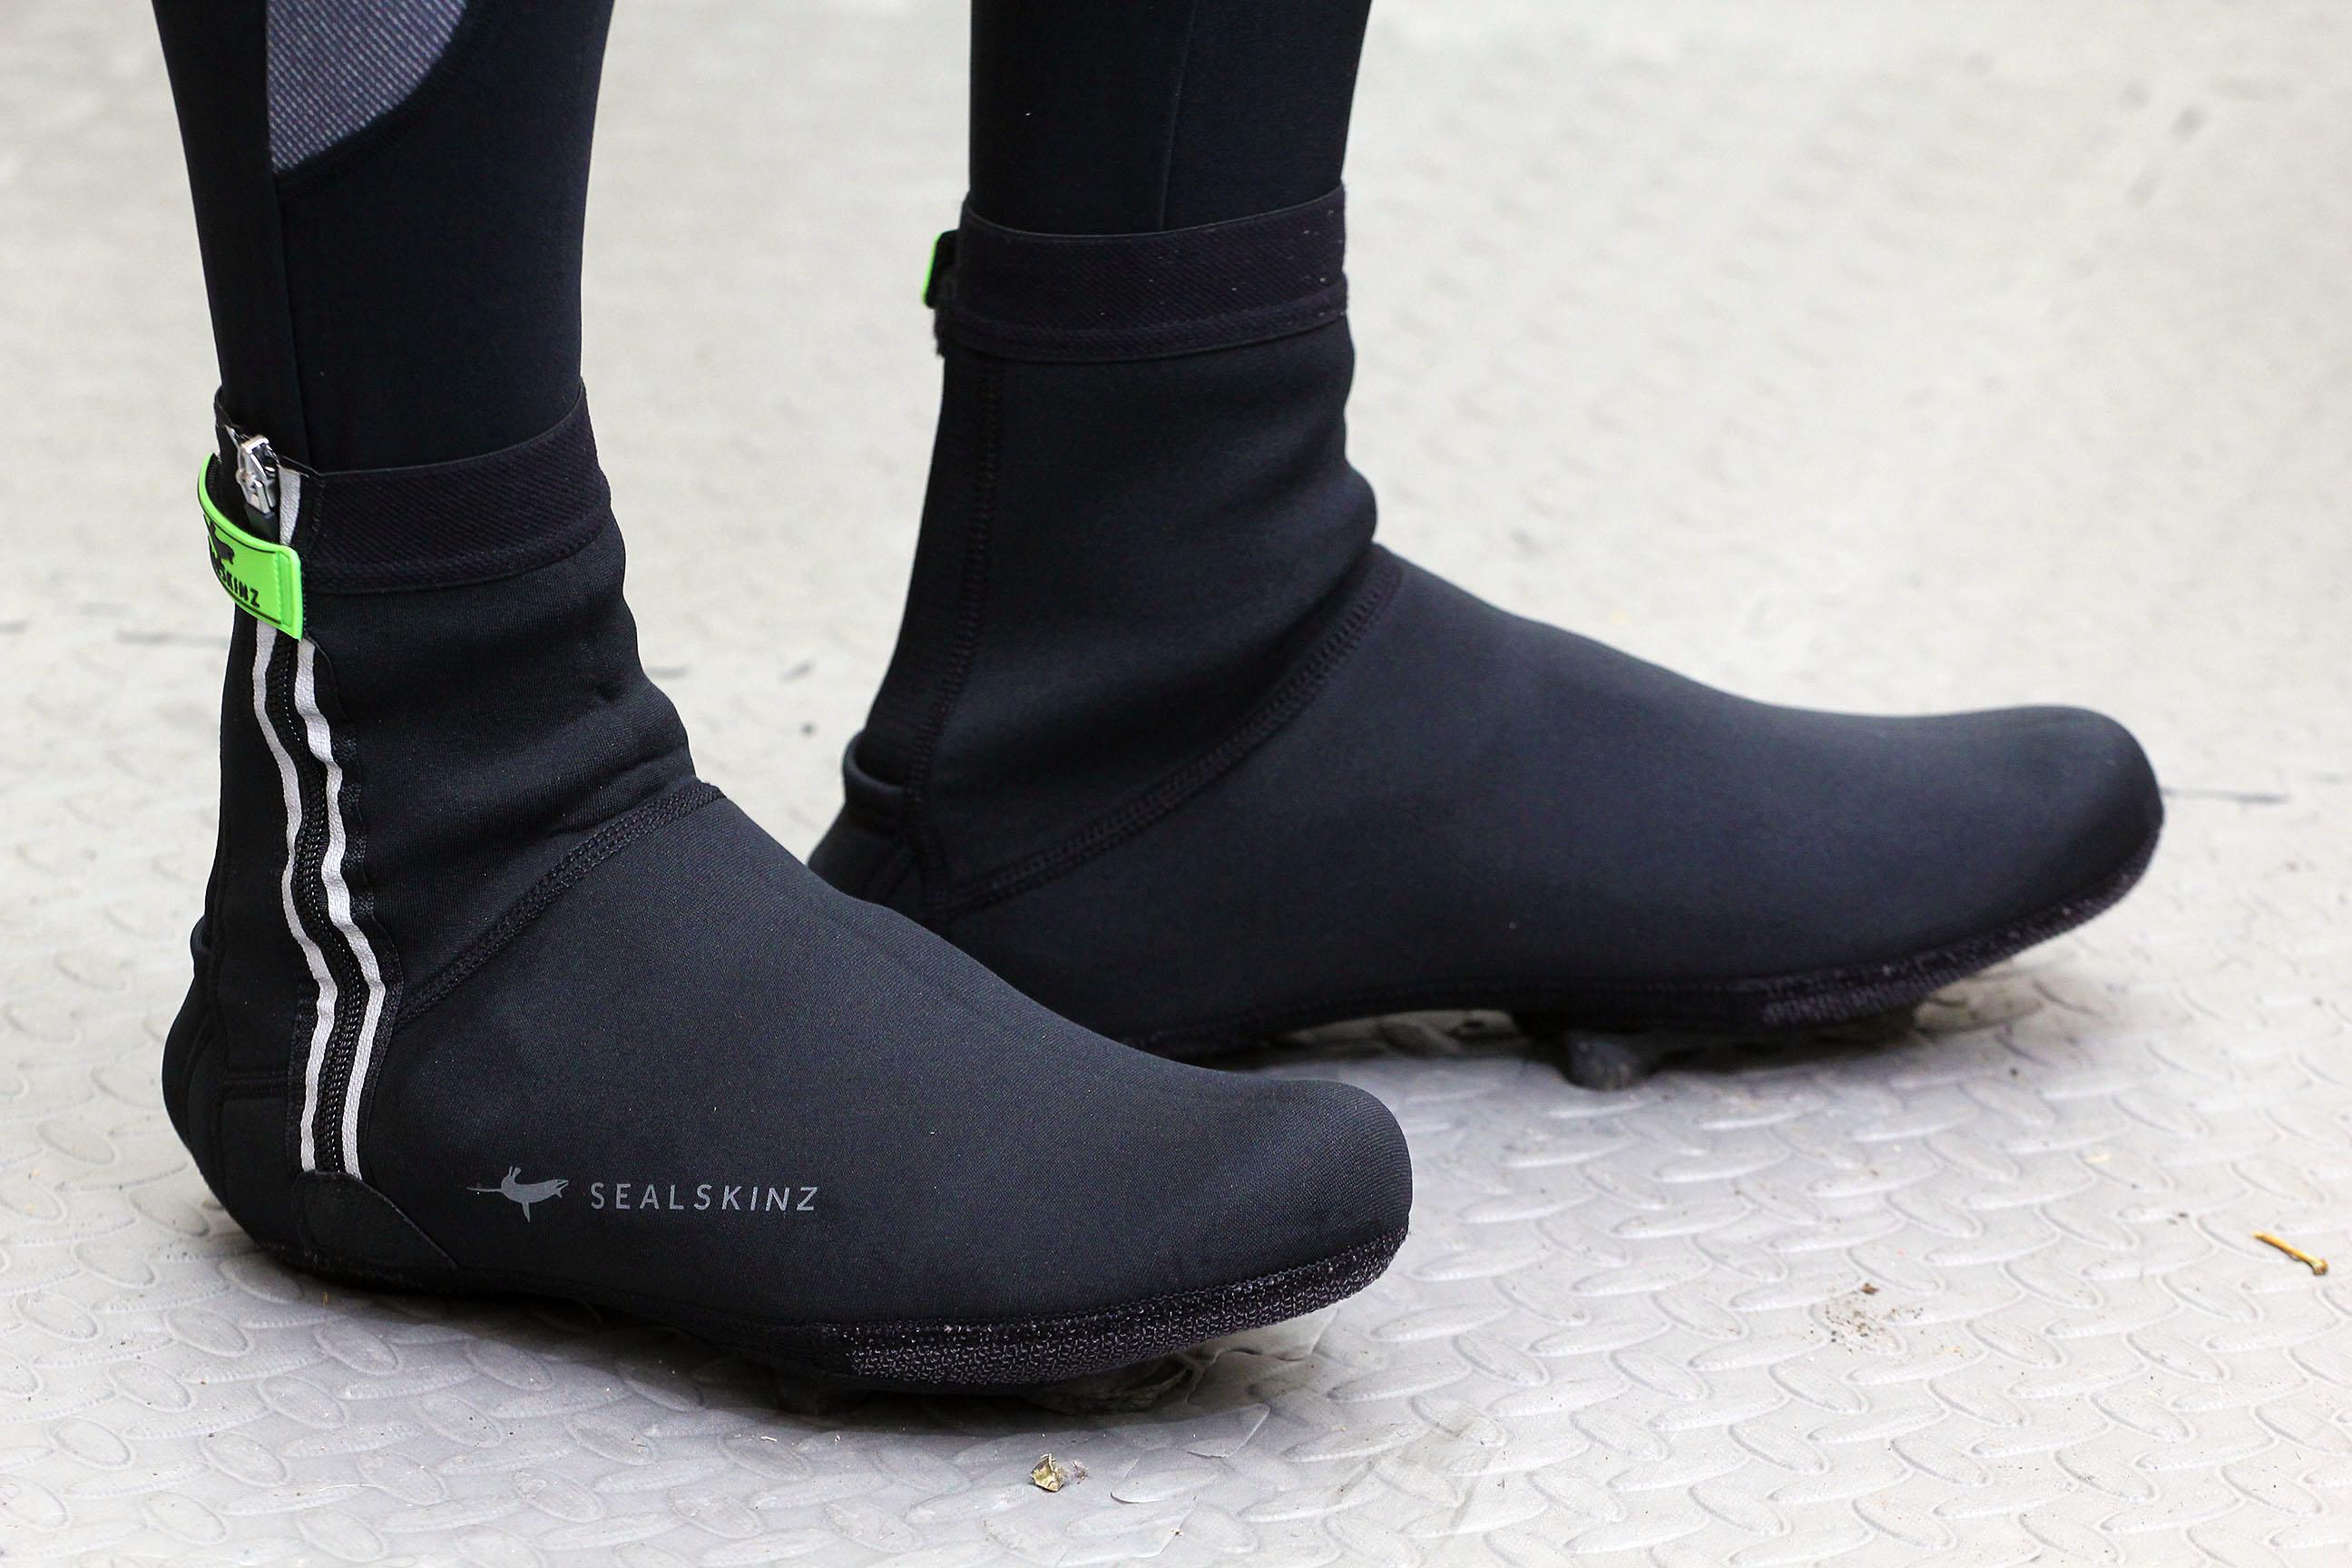 SealSkinz Neoprene Cycling Overshoes Black